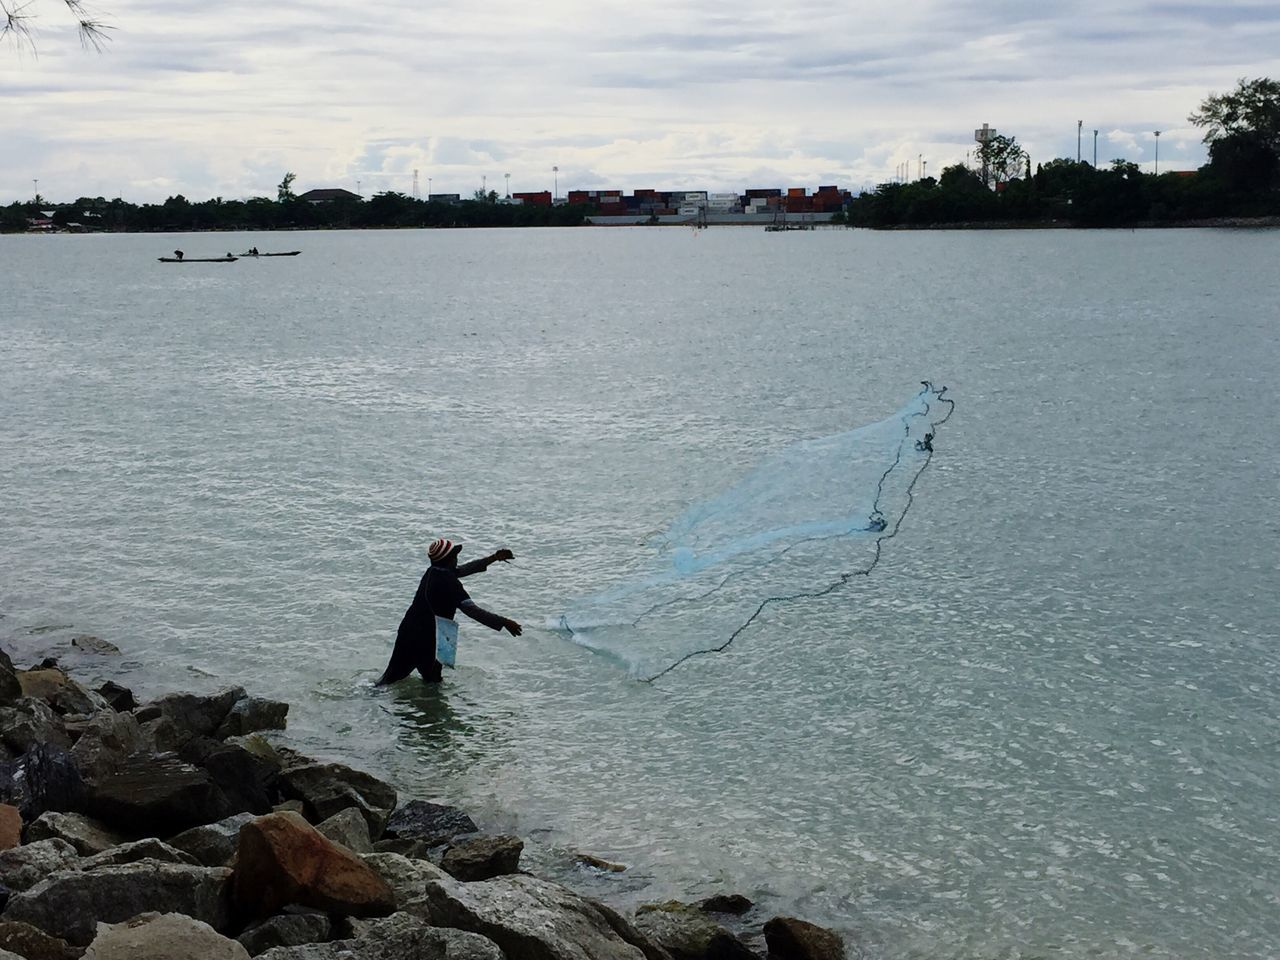 Day Thailand Outdoors Man Lifestyles Sea Culture Thai Thaiculture Songkla